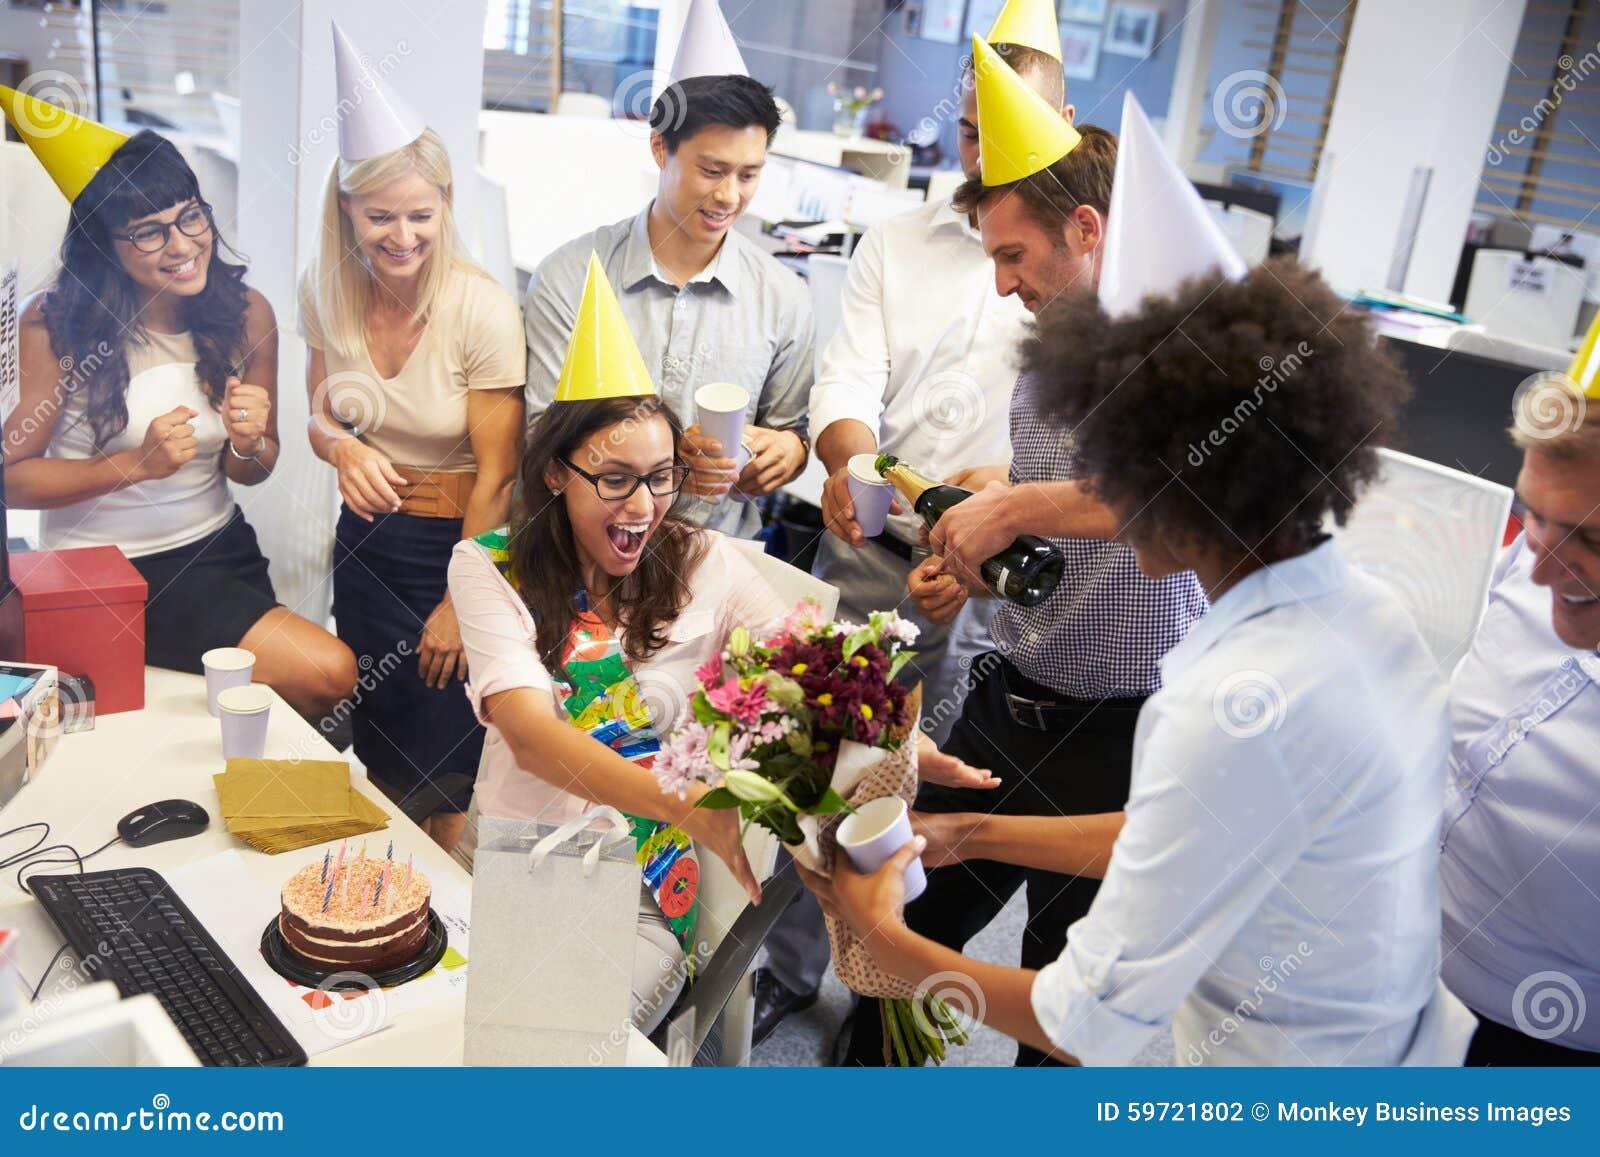 Celebraci n del cumplea os de un colega en la oficina foto for Xxx porno en la oficina